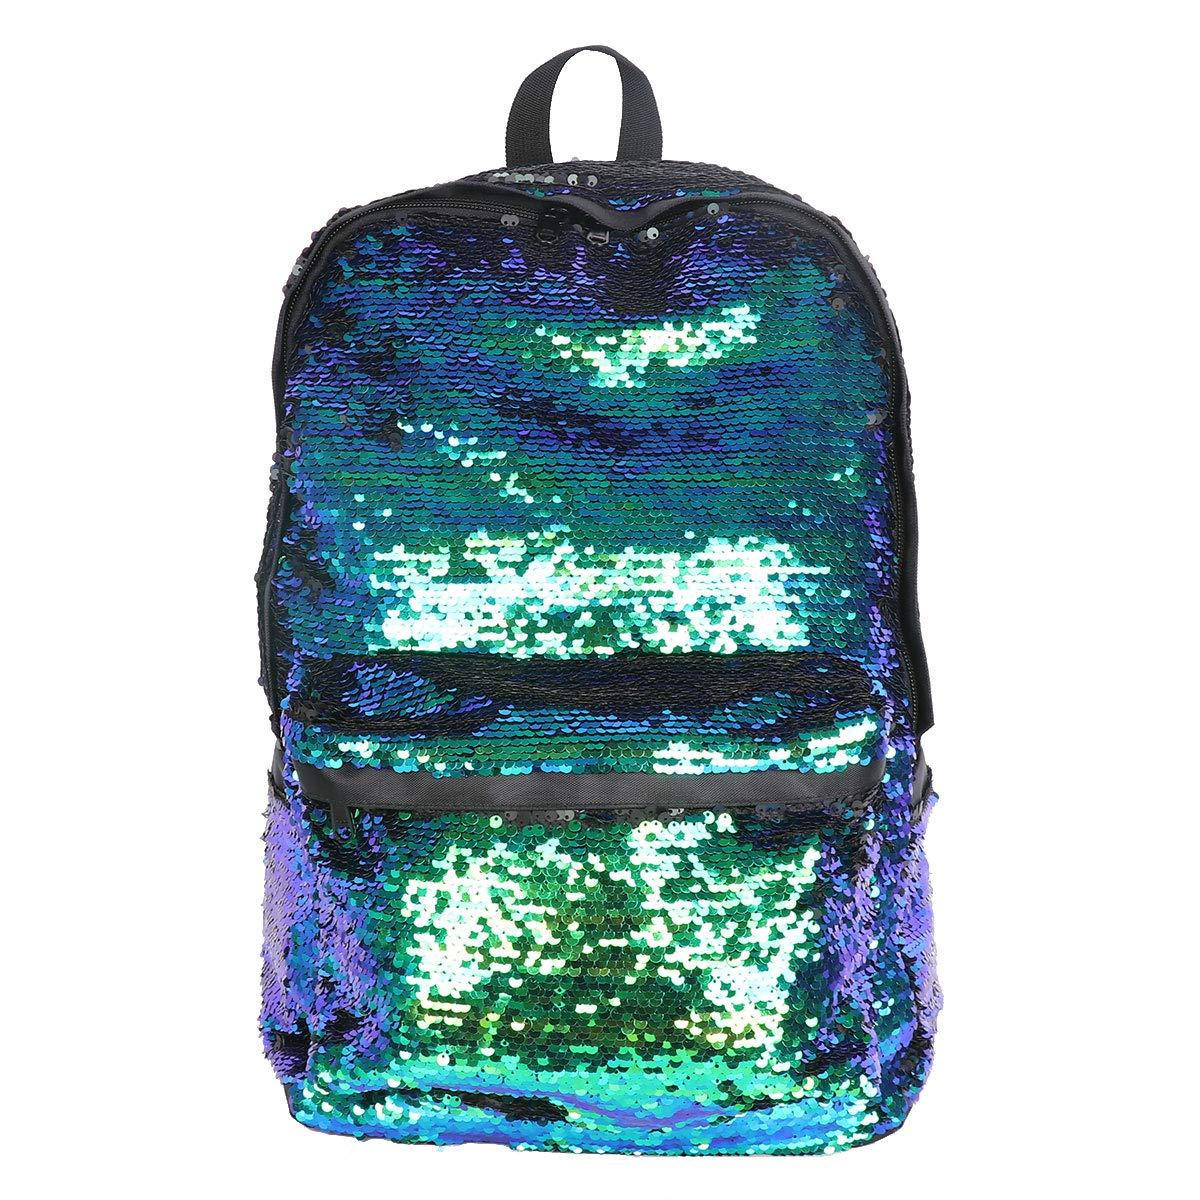 Amazon.com | Freebily Girls Sequins Backpack Glitter Bling Rucksack Women Sparkle Casual Daypack School Travel Shoulder Bag Green One Size | Kids Backpacks